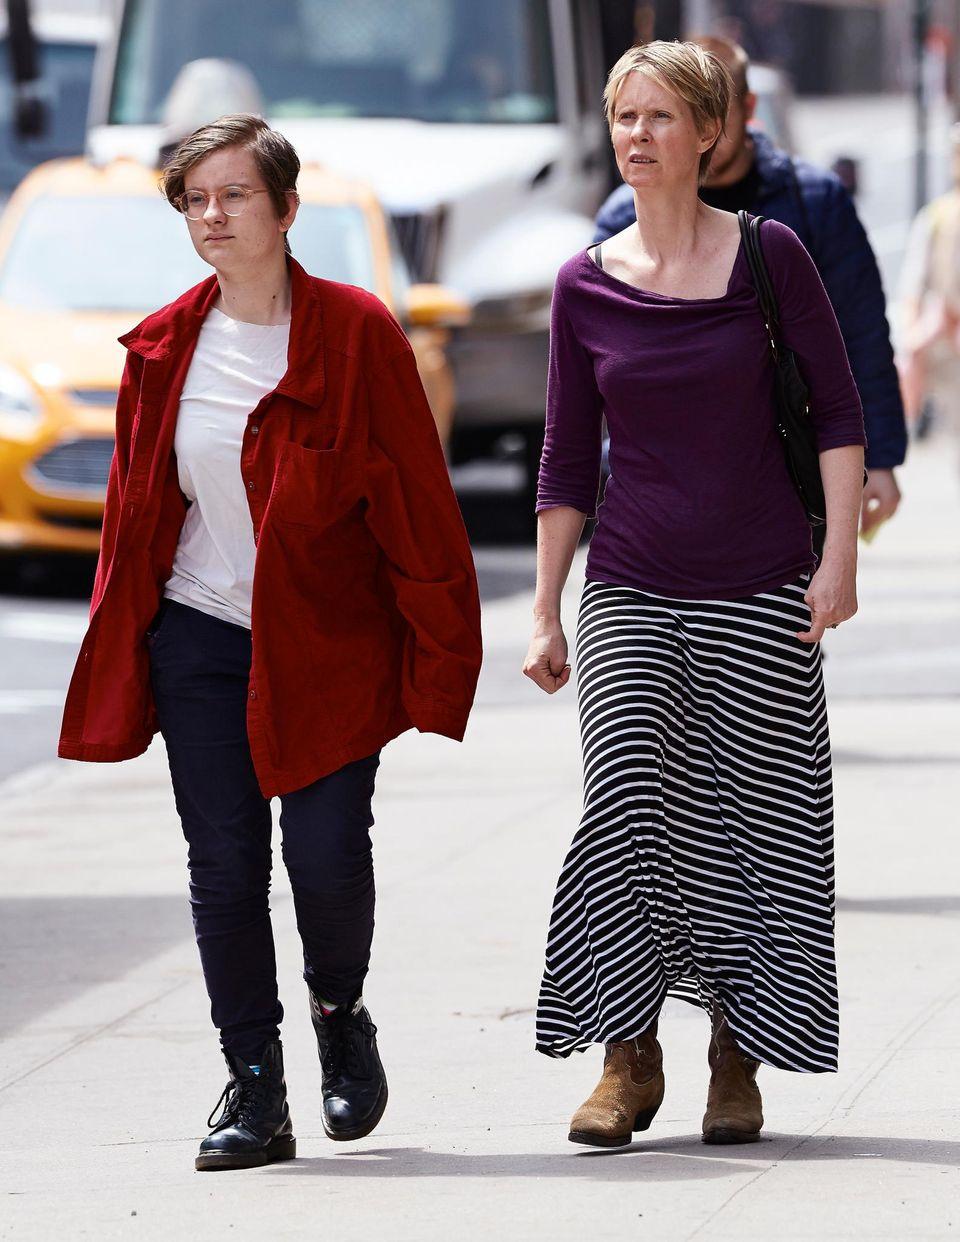 22. April 2014: Cynthia Nixon ist mit ihrer Frau Christine Marinoni im New Yorker East Village unterwegs.